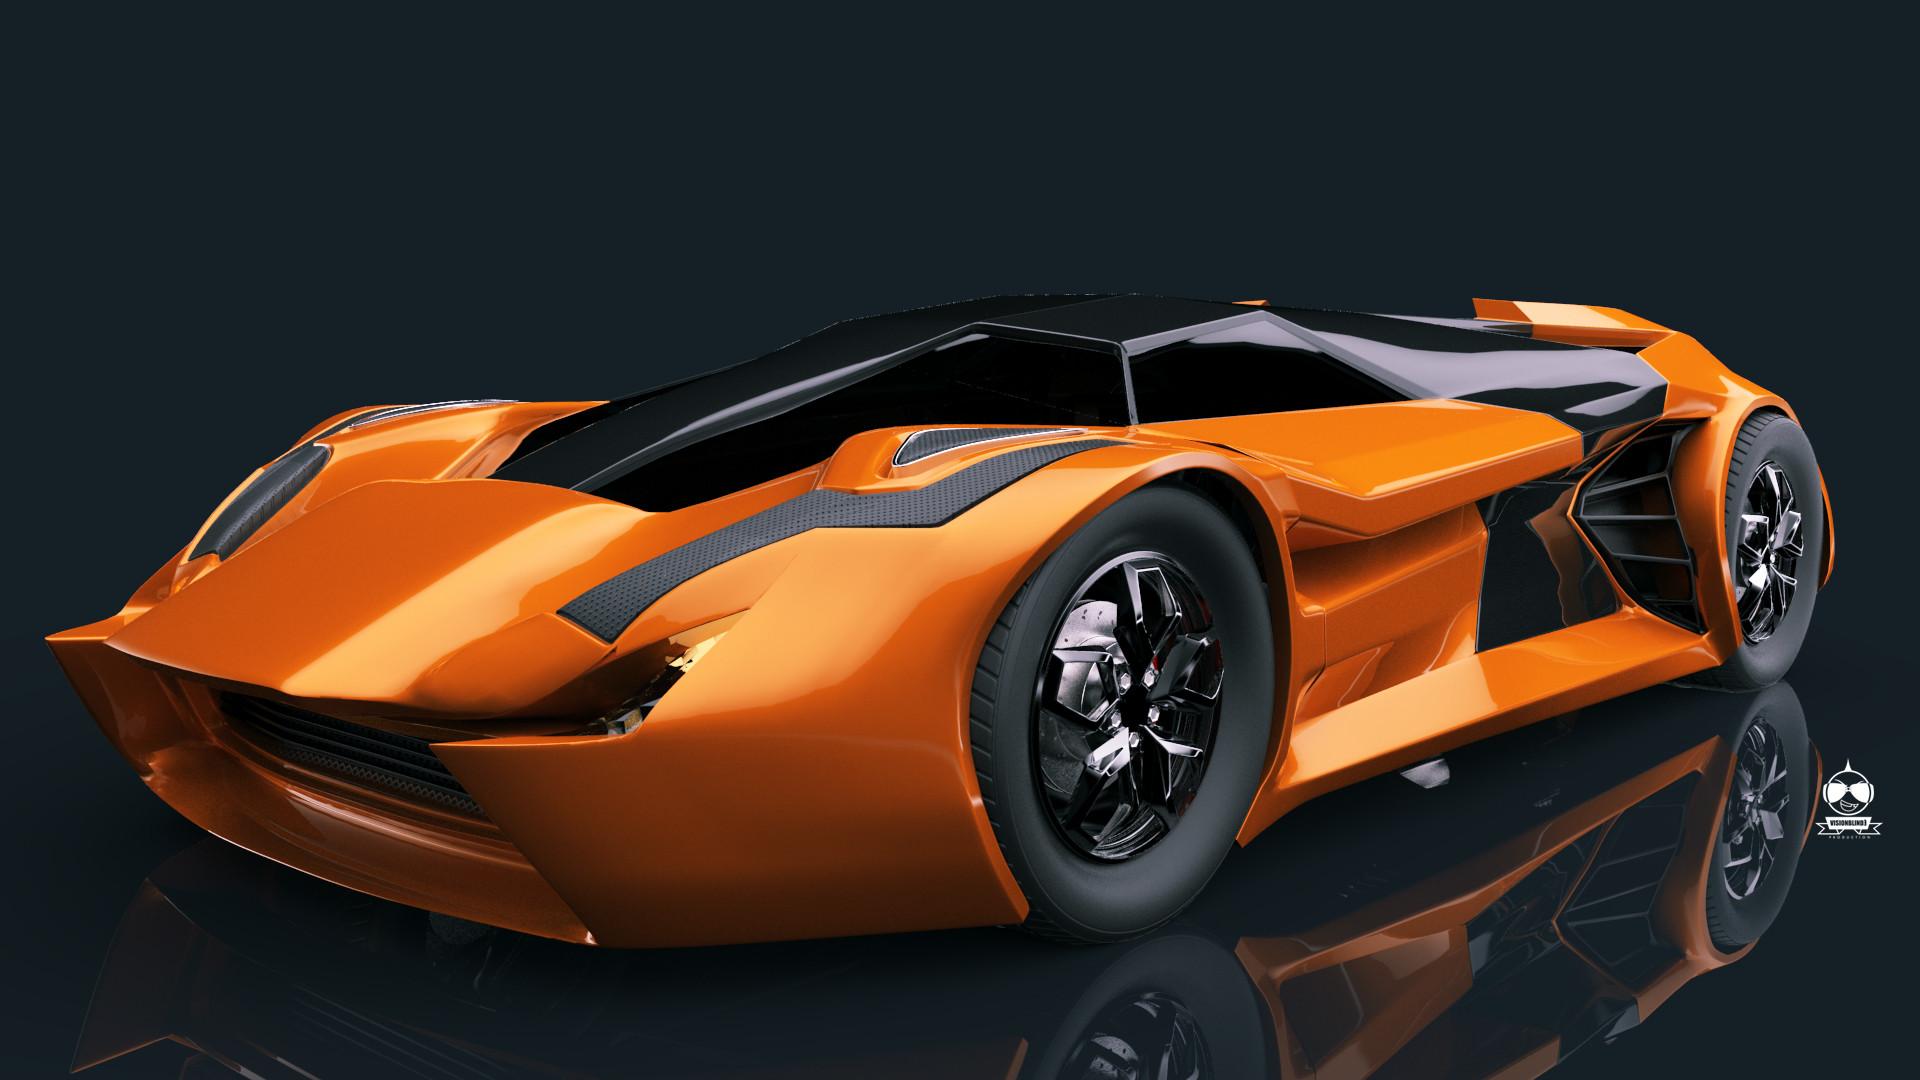 Kadilu Alex Lamborghini Diamante Concept